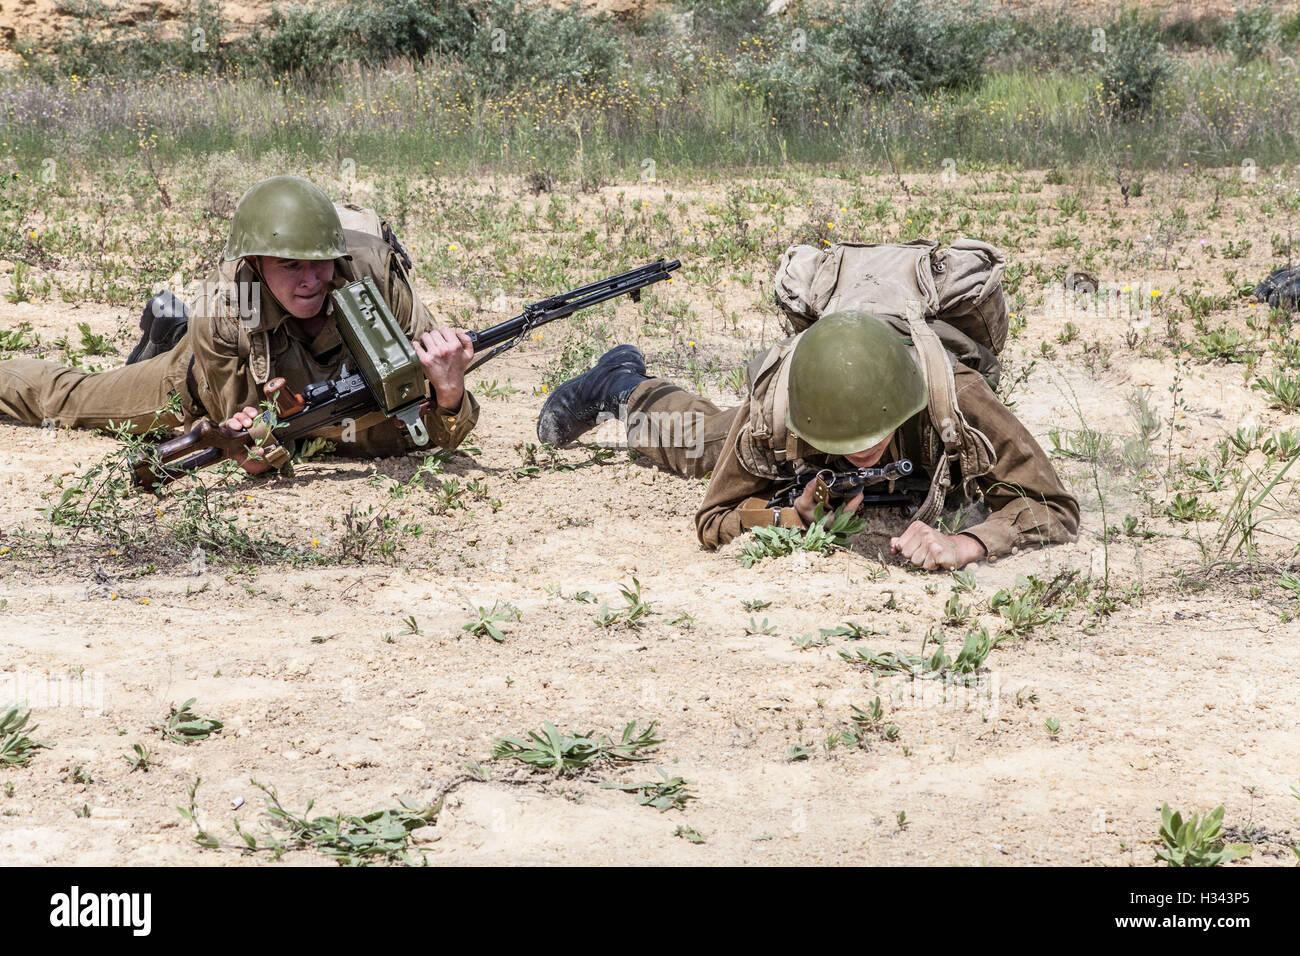 Soviet Afghanistan war - Page 6 Soviet-spetsnaz-in-afghanistan-H343P5